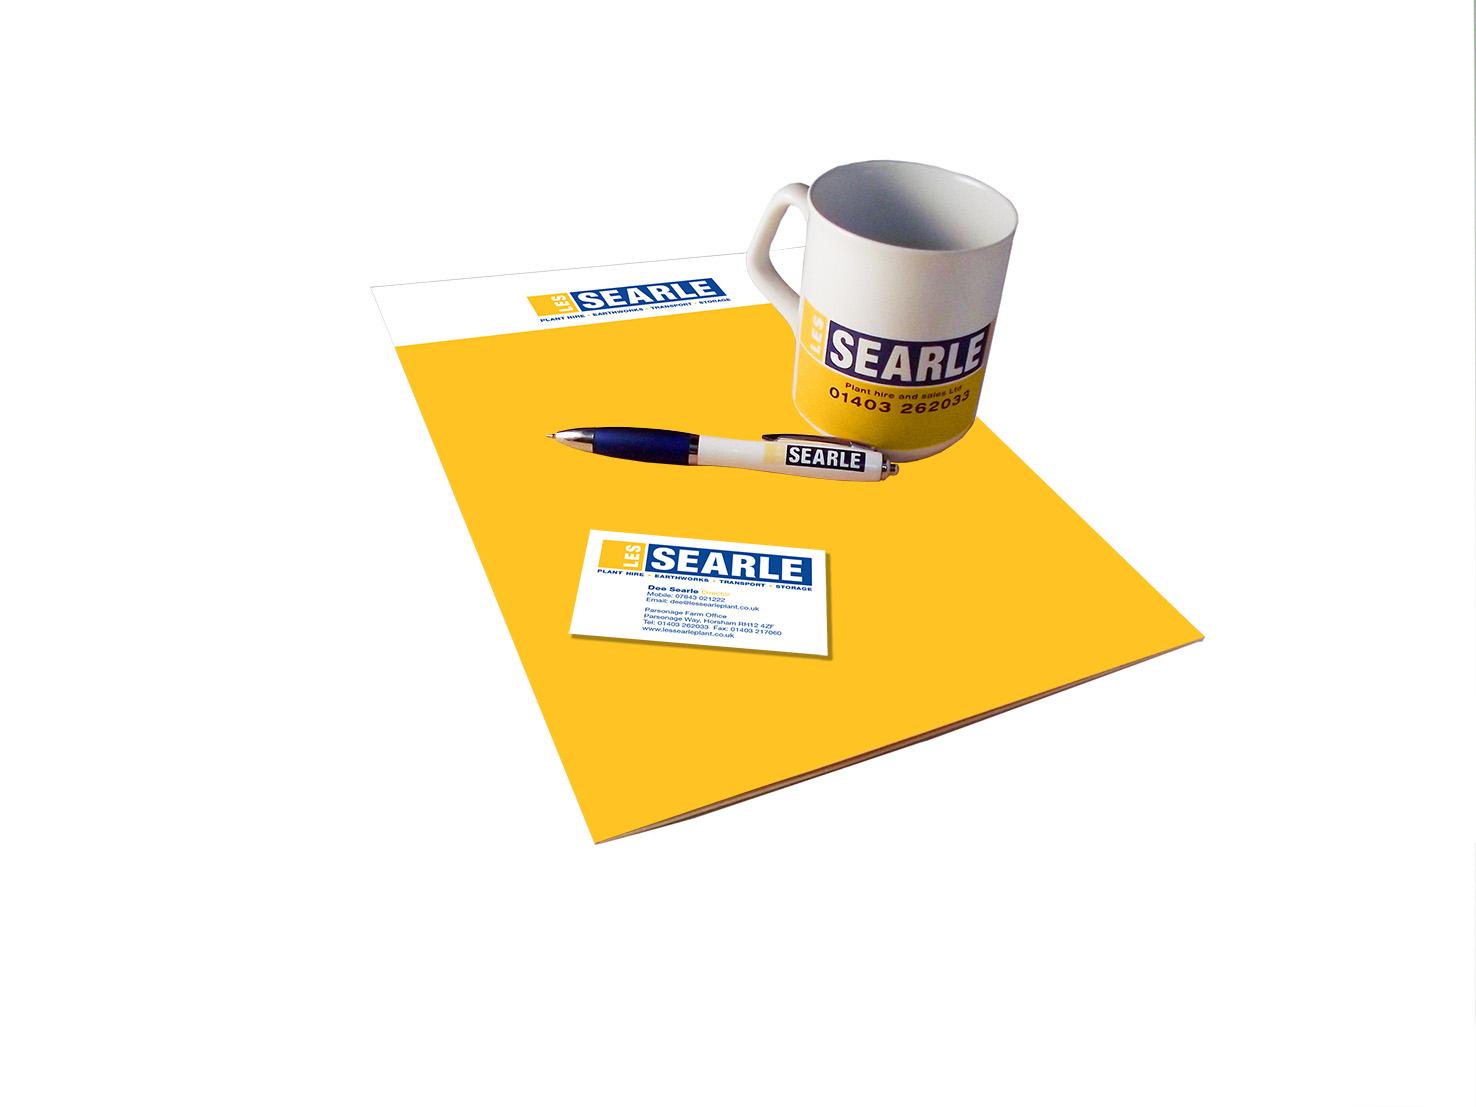 Les Searle mug and stationery